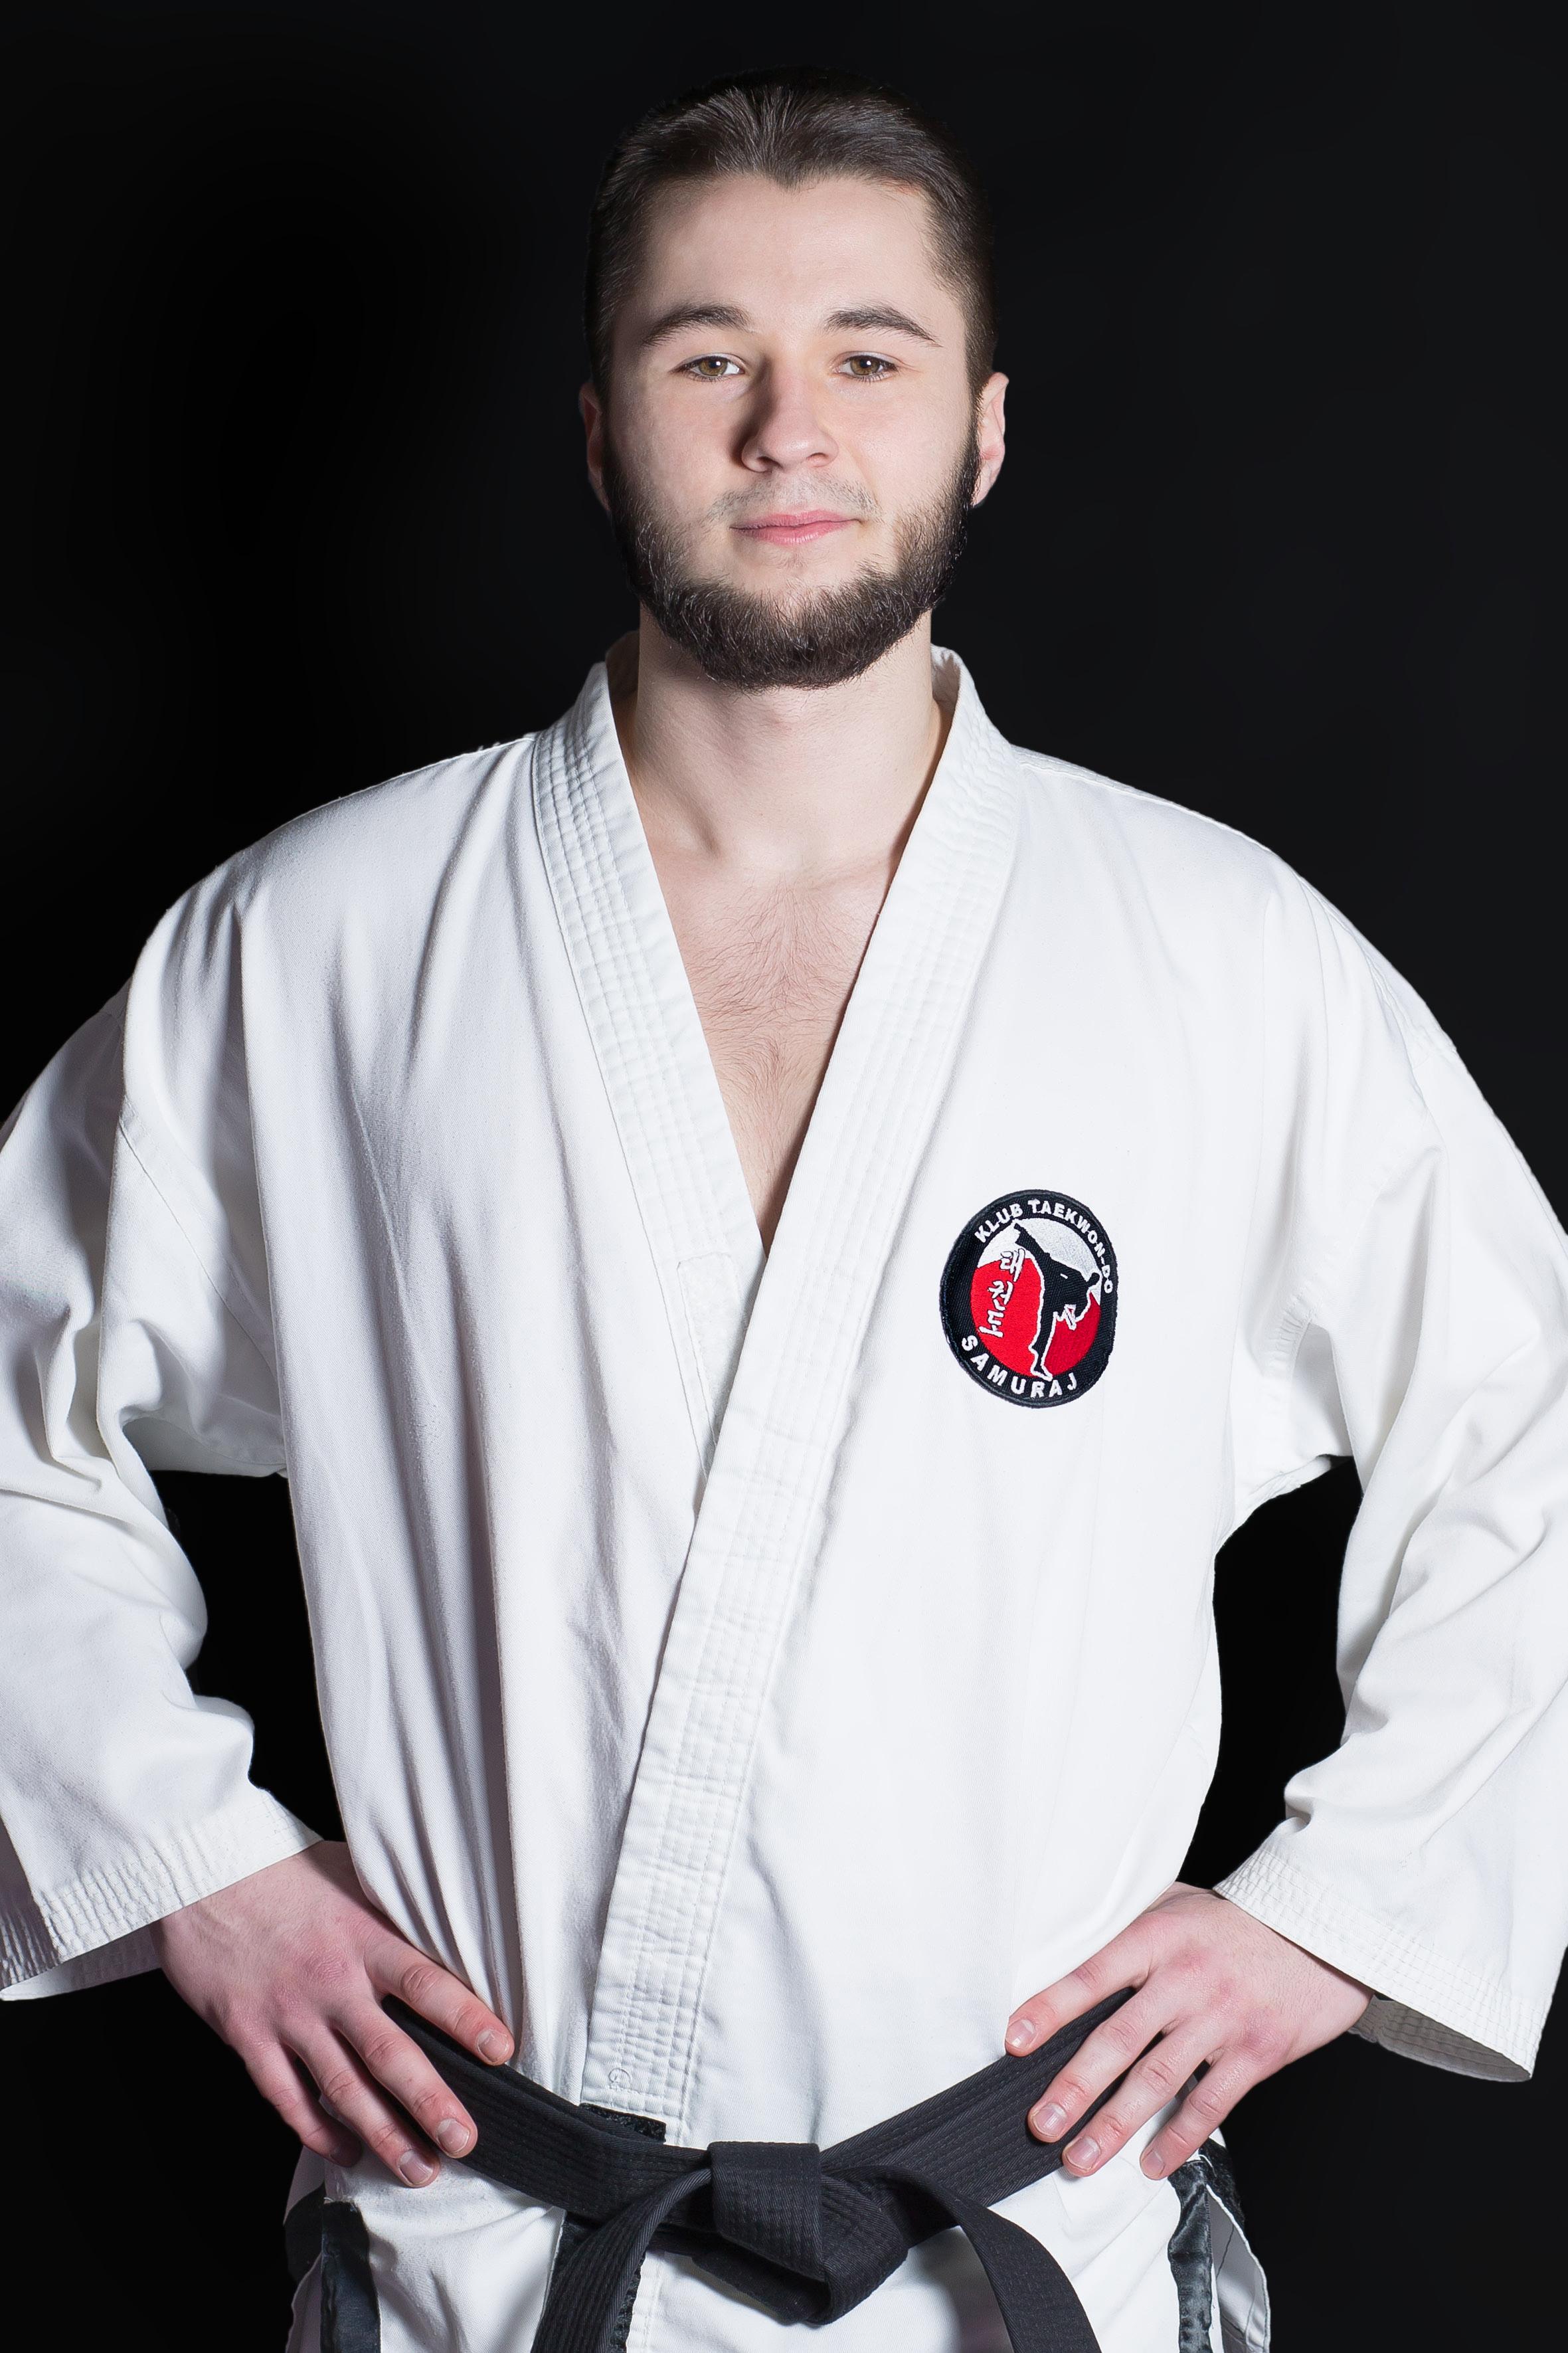 Jakub Ryba